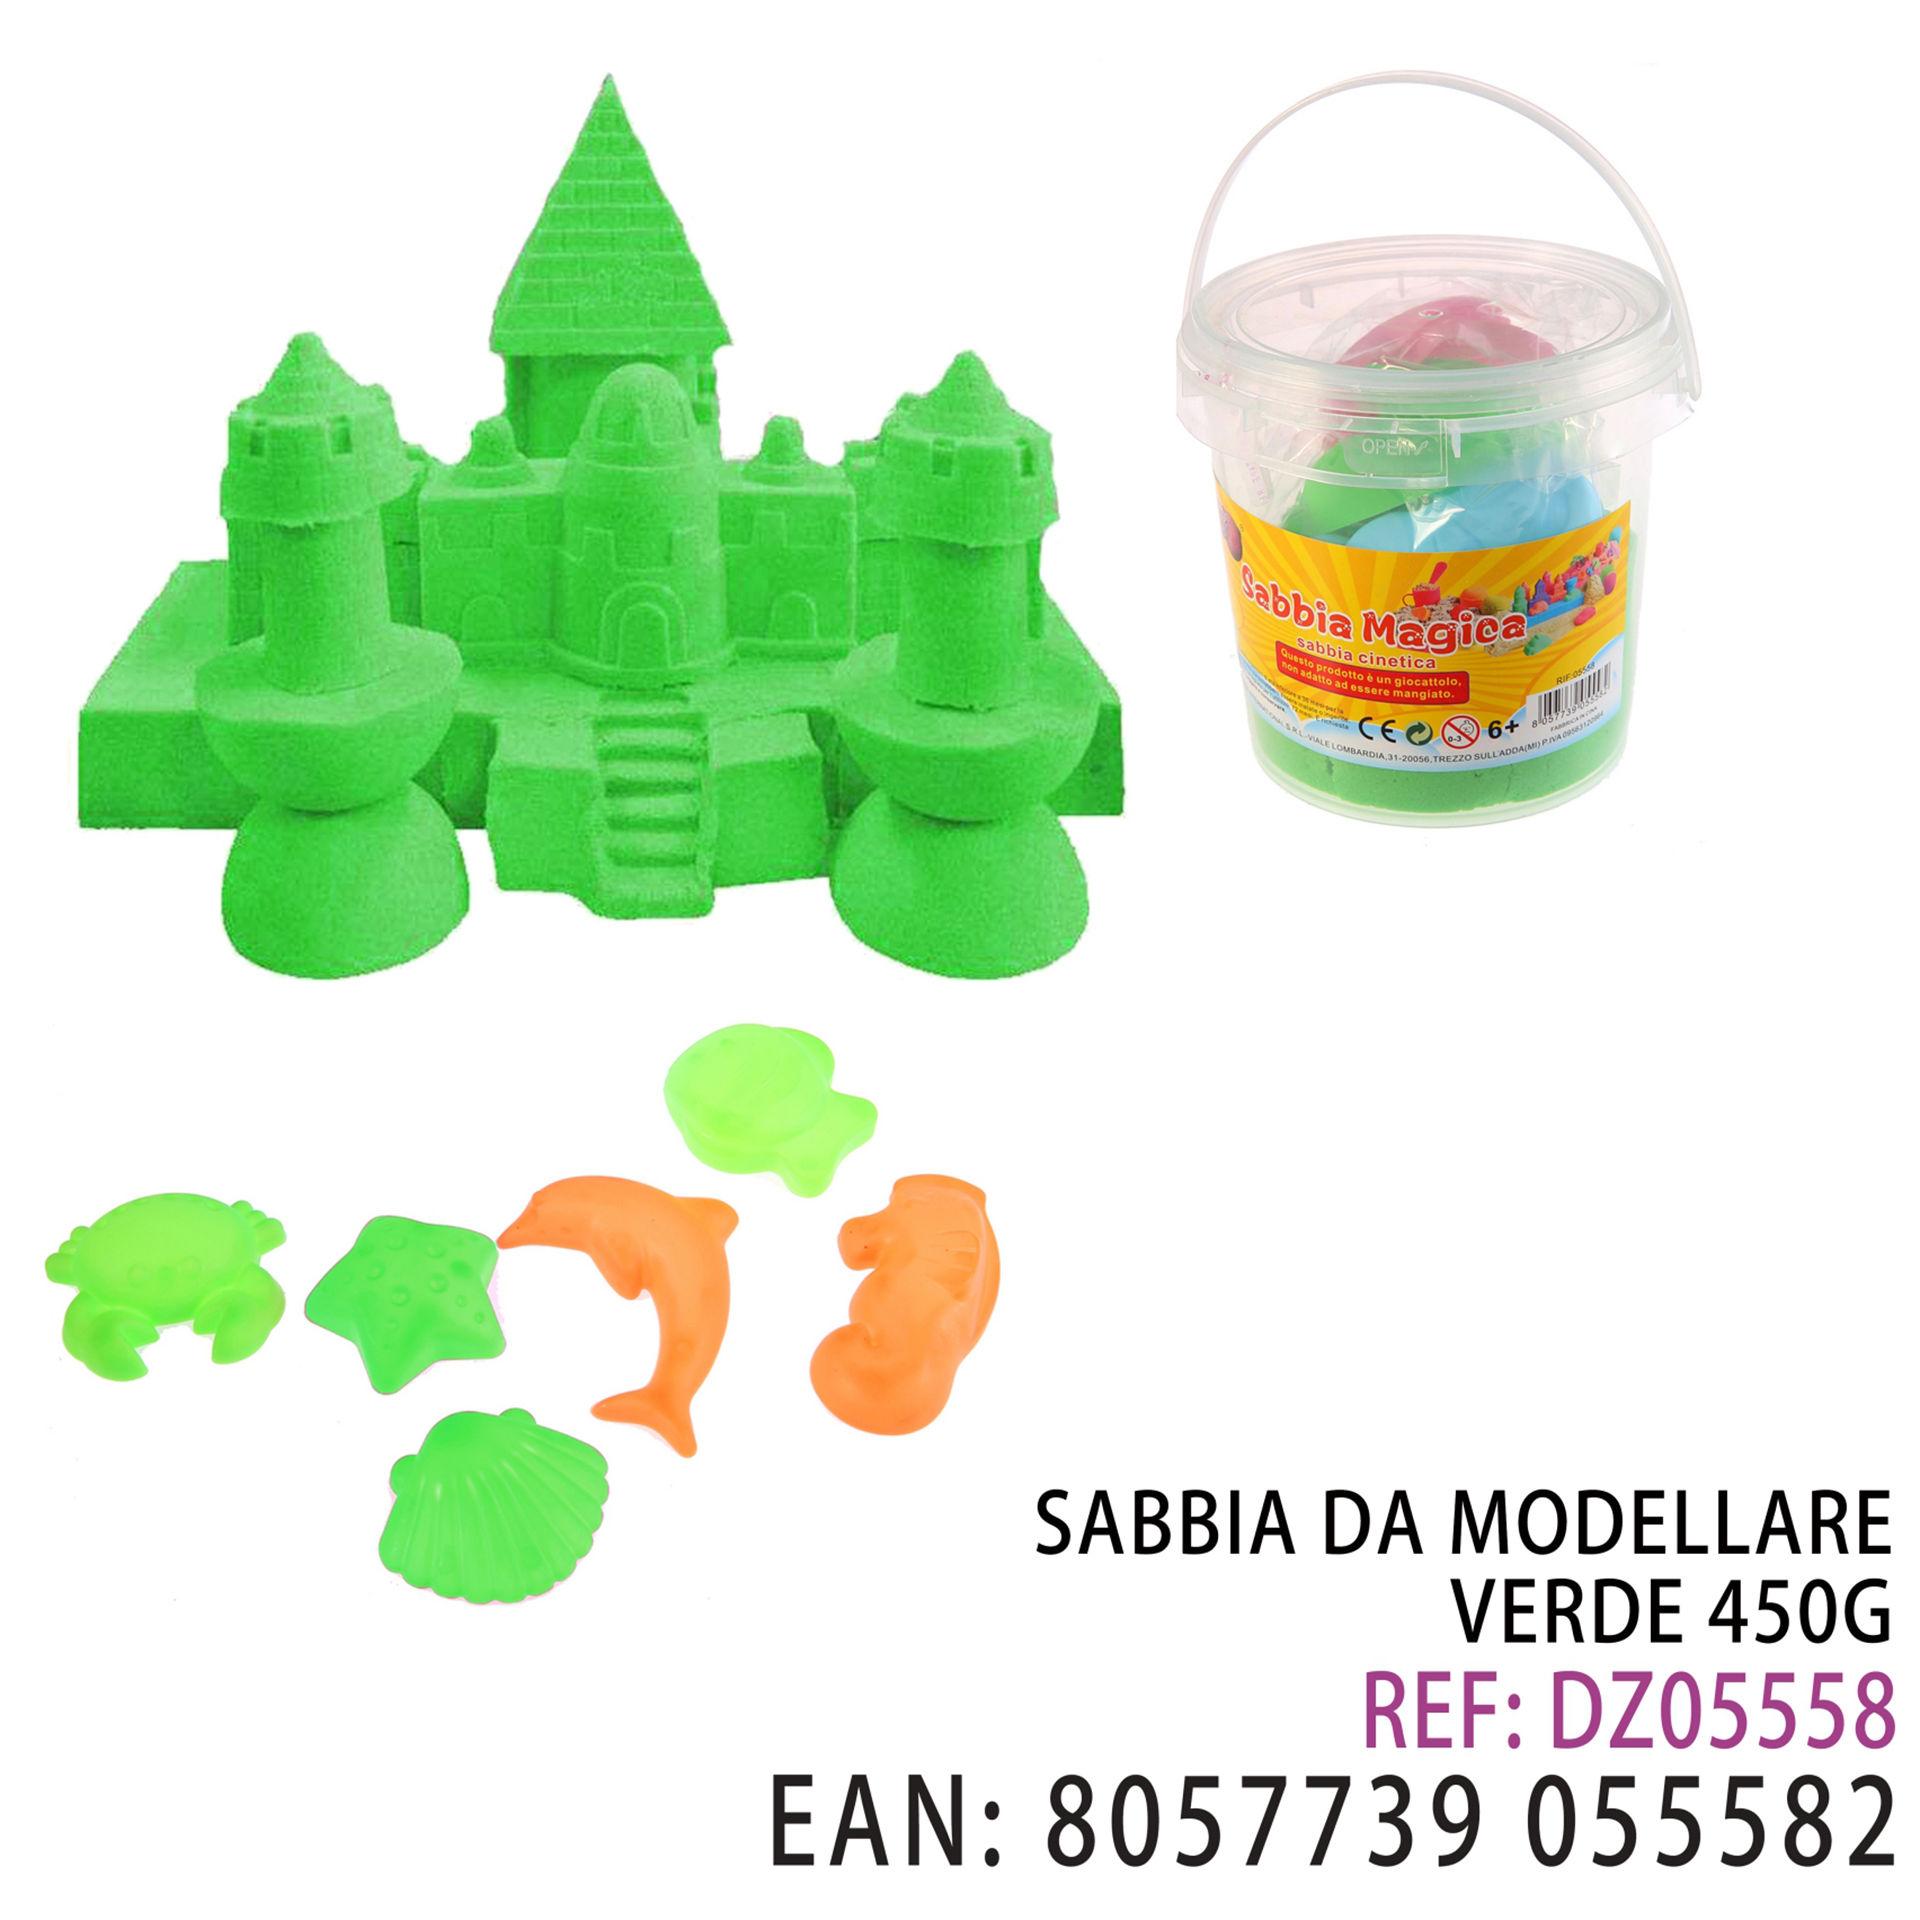 SABBIA DA MODELLARE VERDE 450GDz